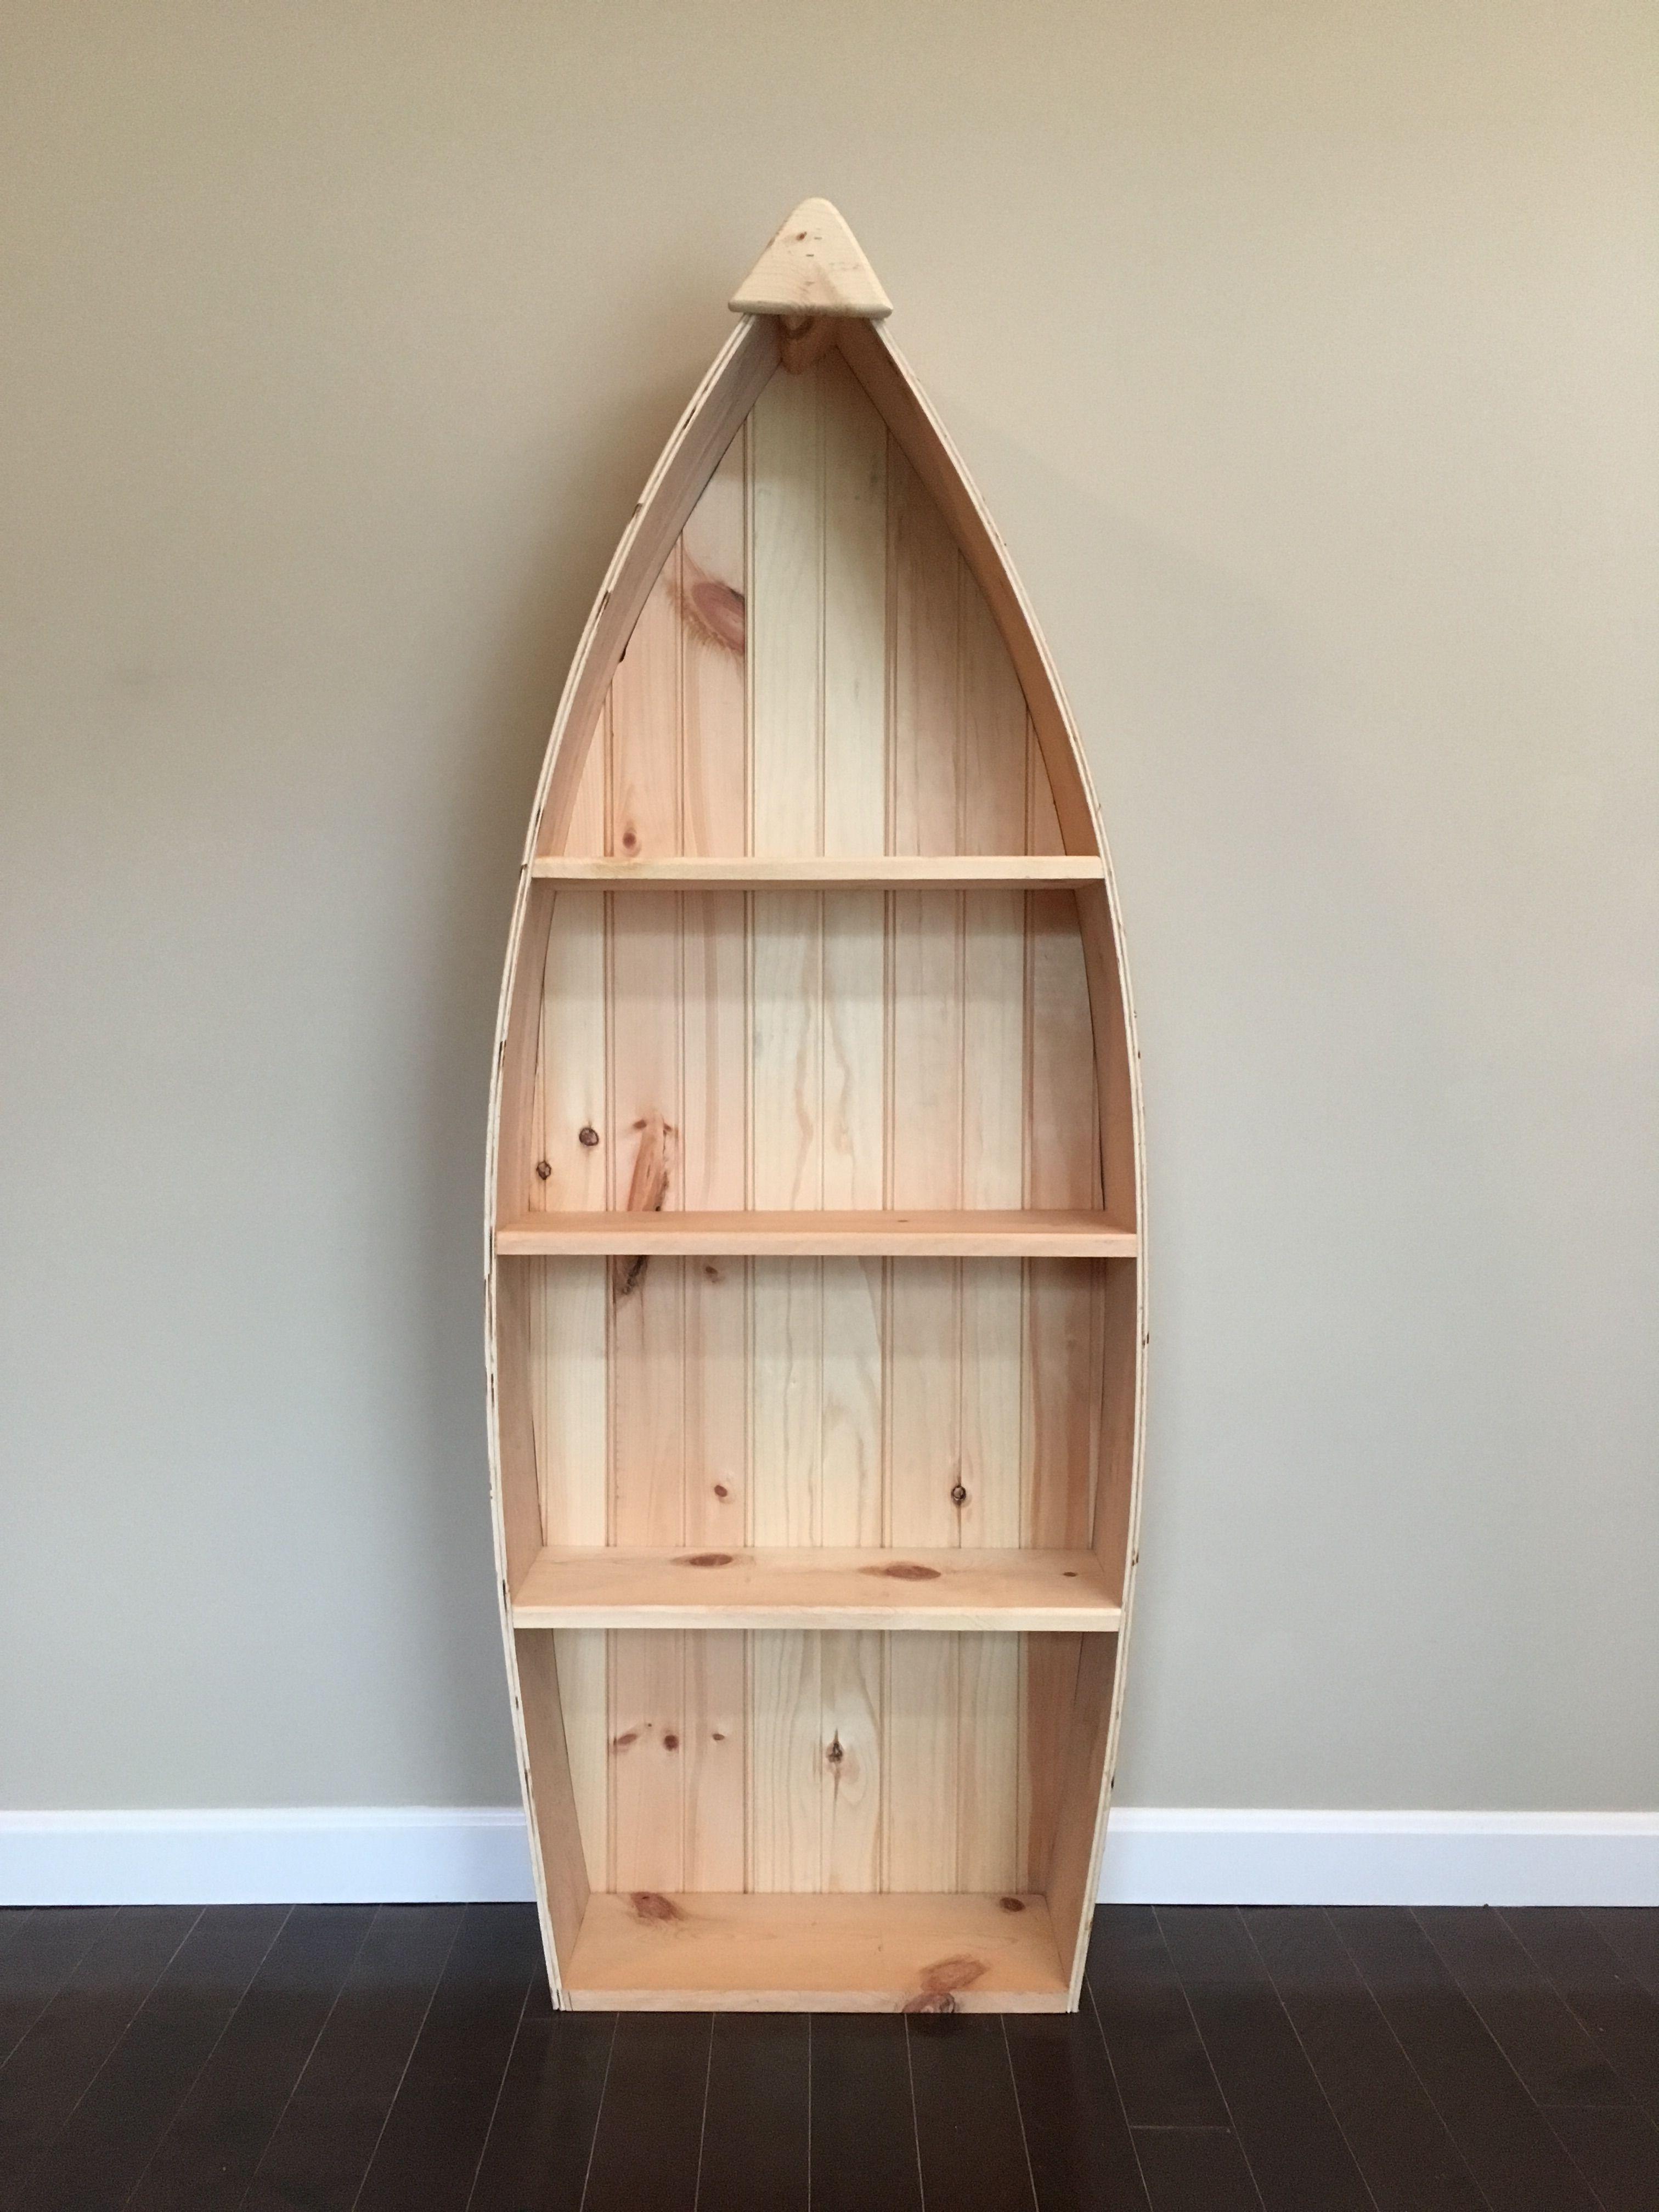 Boat Shelf Decor